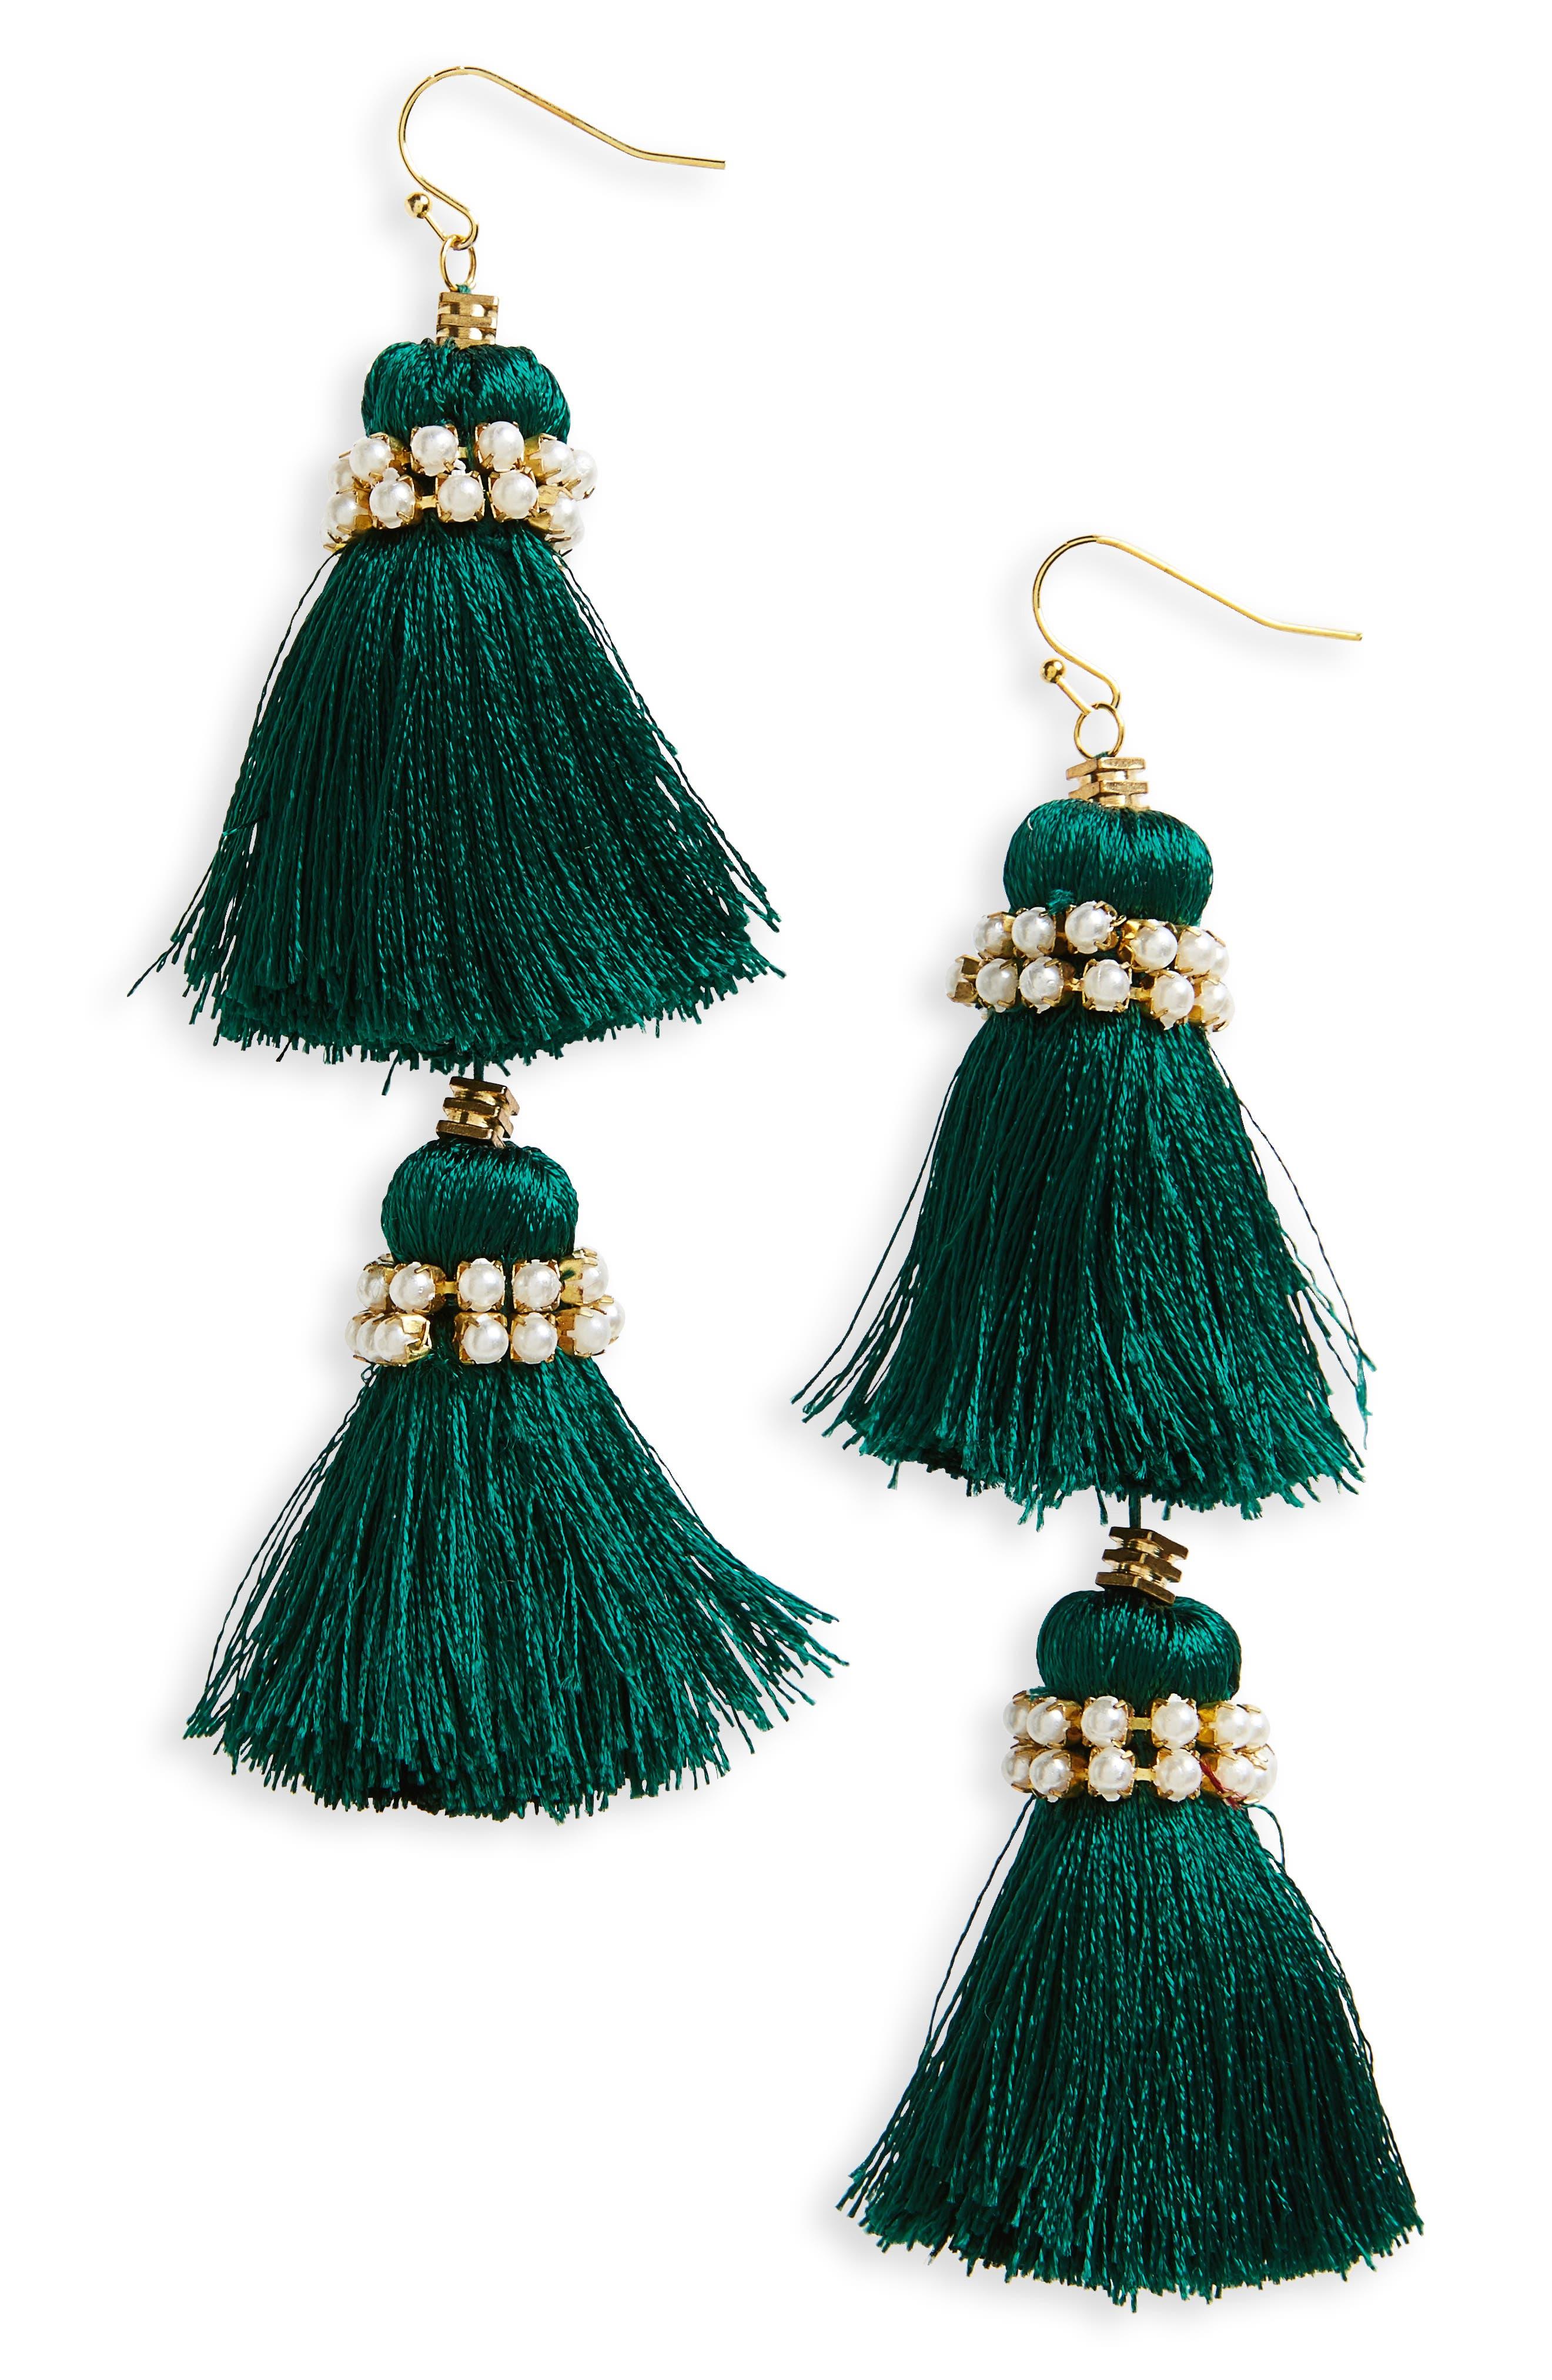 Imitation Pearl & Tassel Earrings,                             Main thumbnail 1, color,                             300